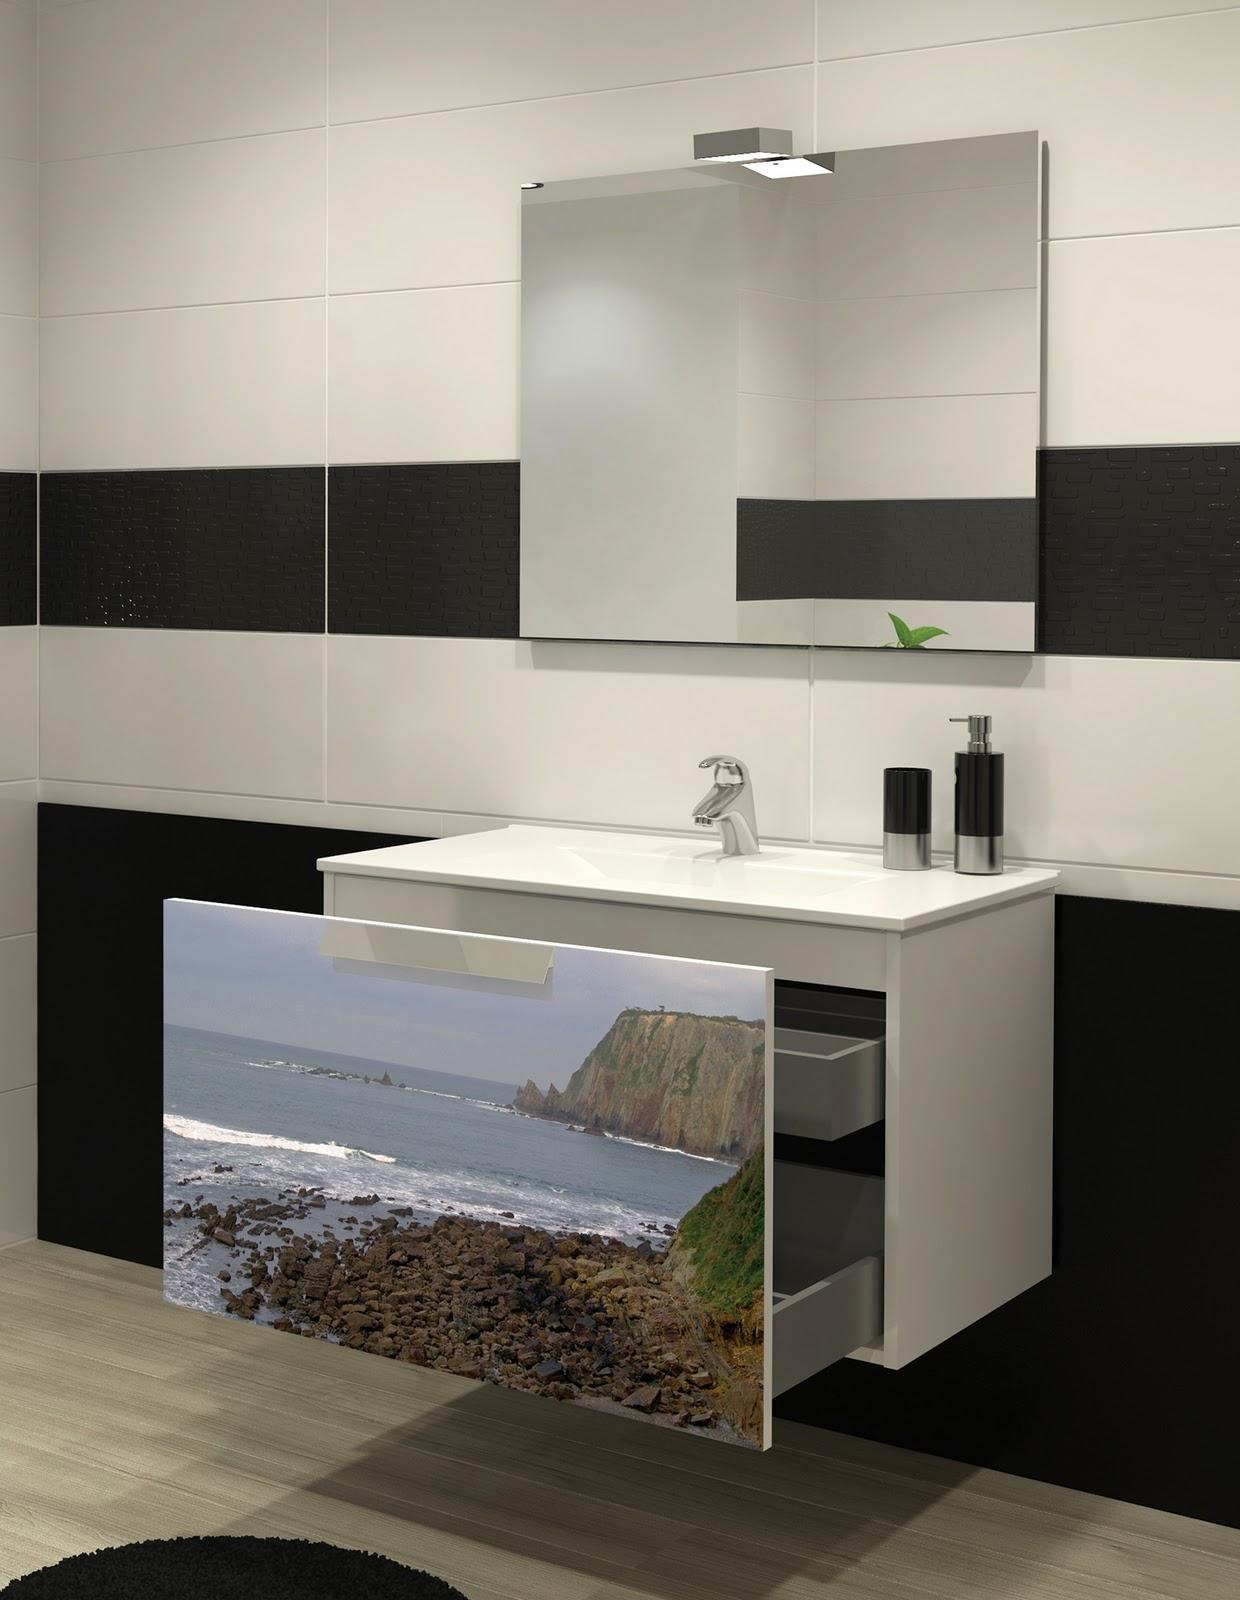 Ba o con ducha muebles de ba o photo de kitbath - Muebles bano asturias ...